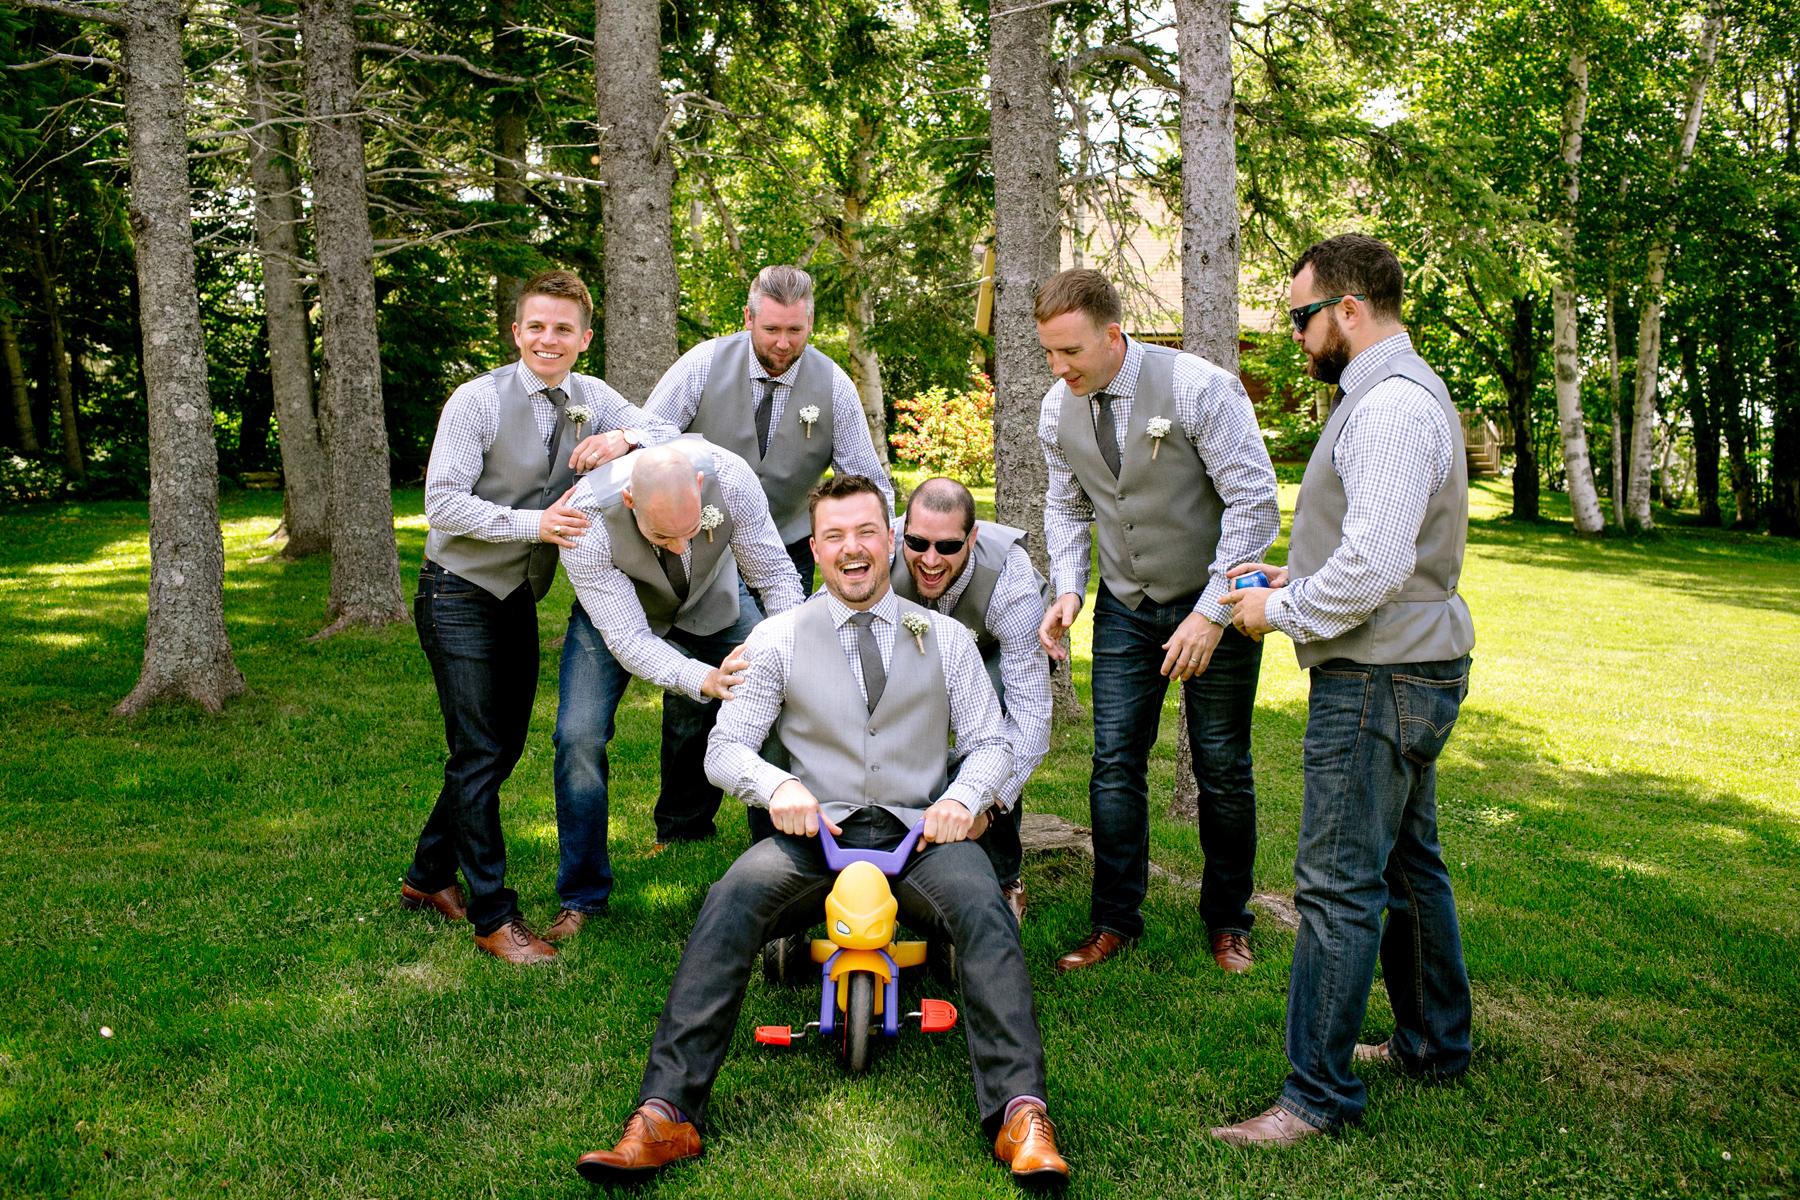 004-awesome-pei-wedding-photography-kandisebrown